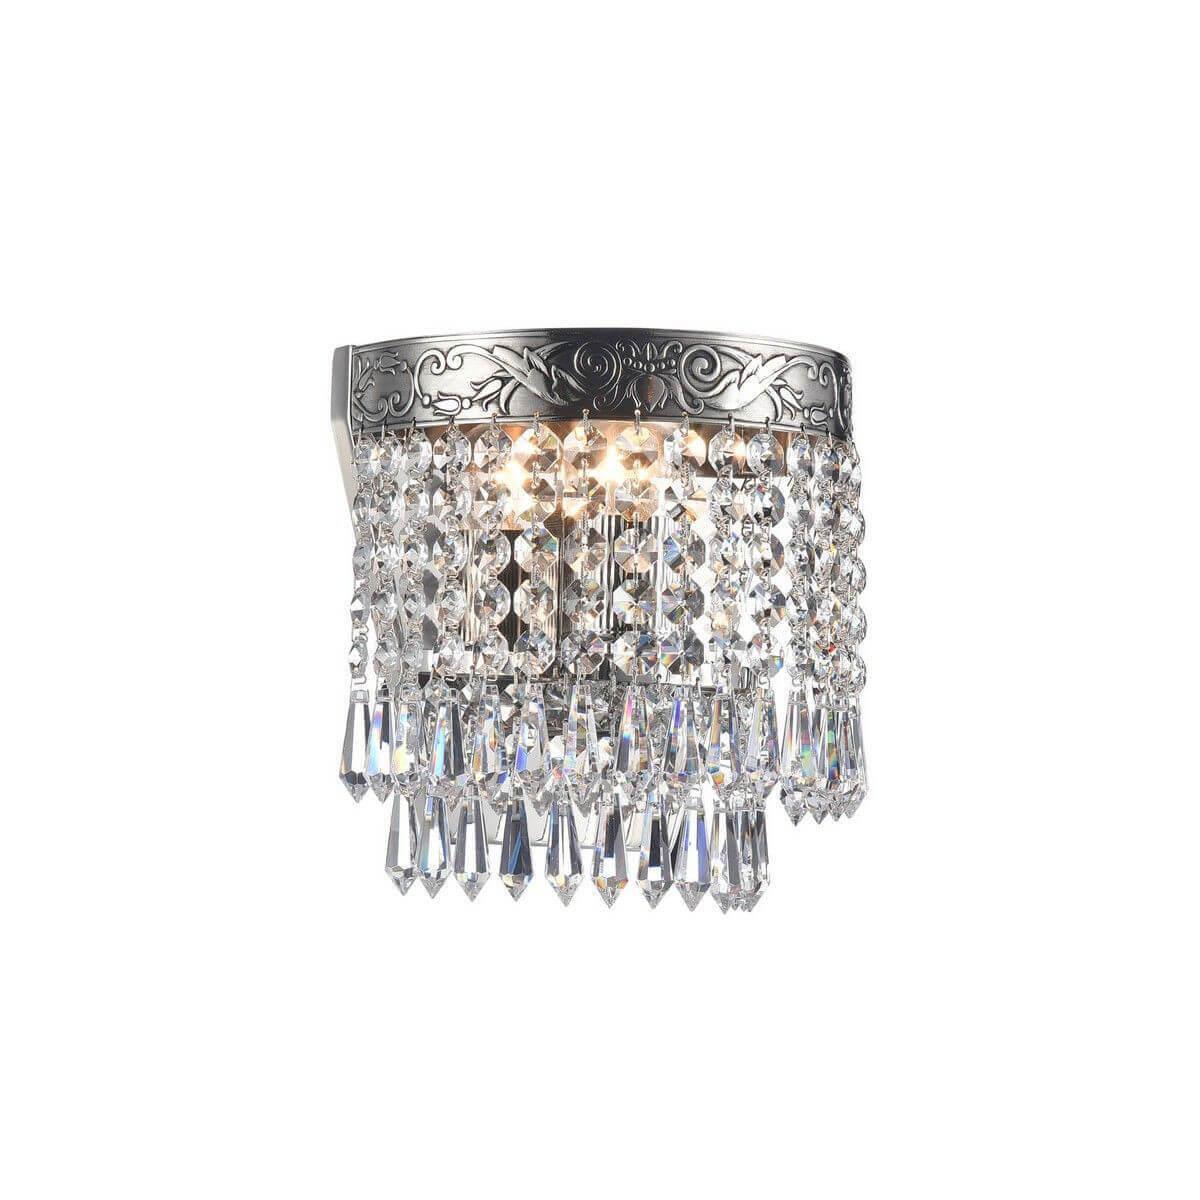 Настенный светильник Maytoni Palace DIA890-WL-01-N